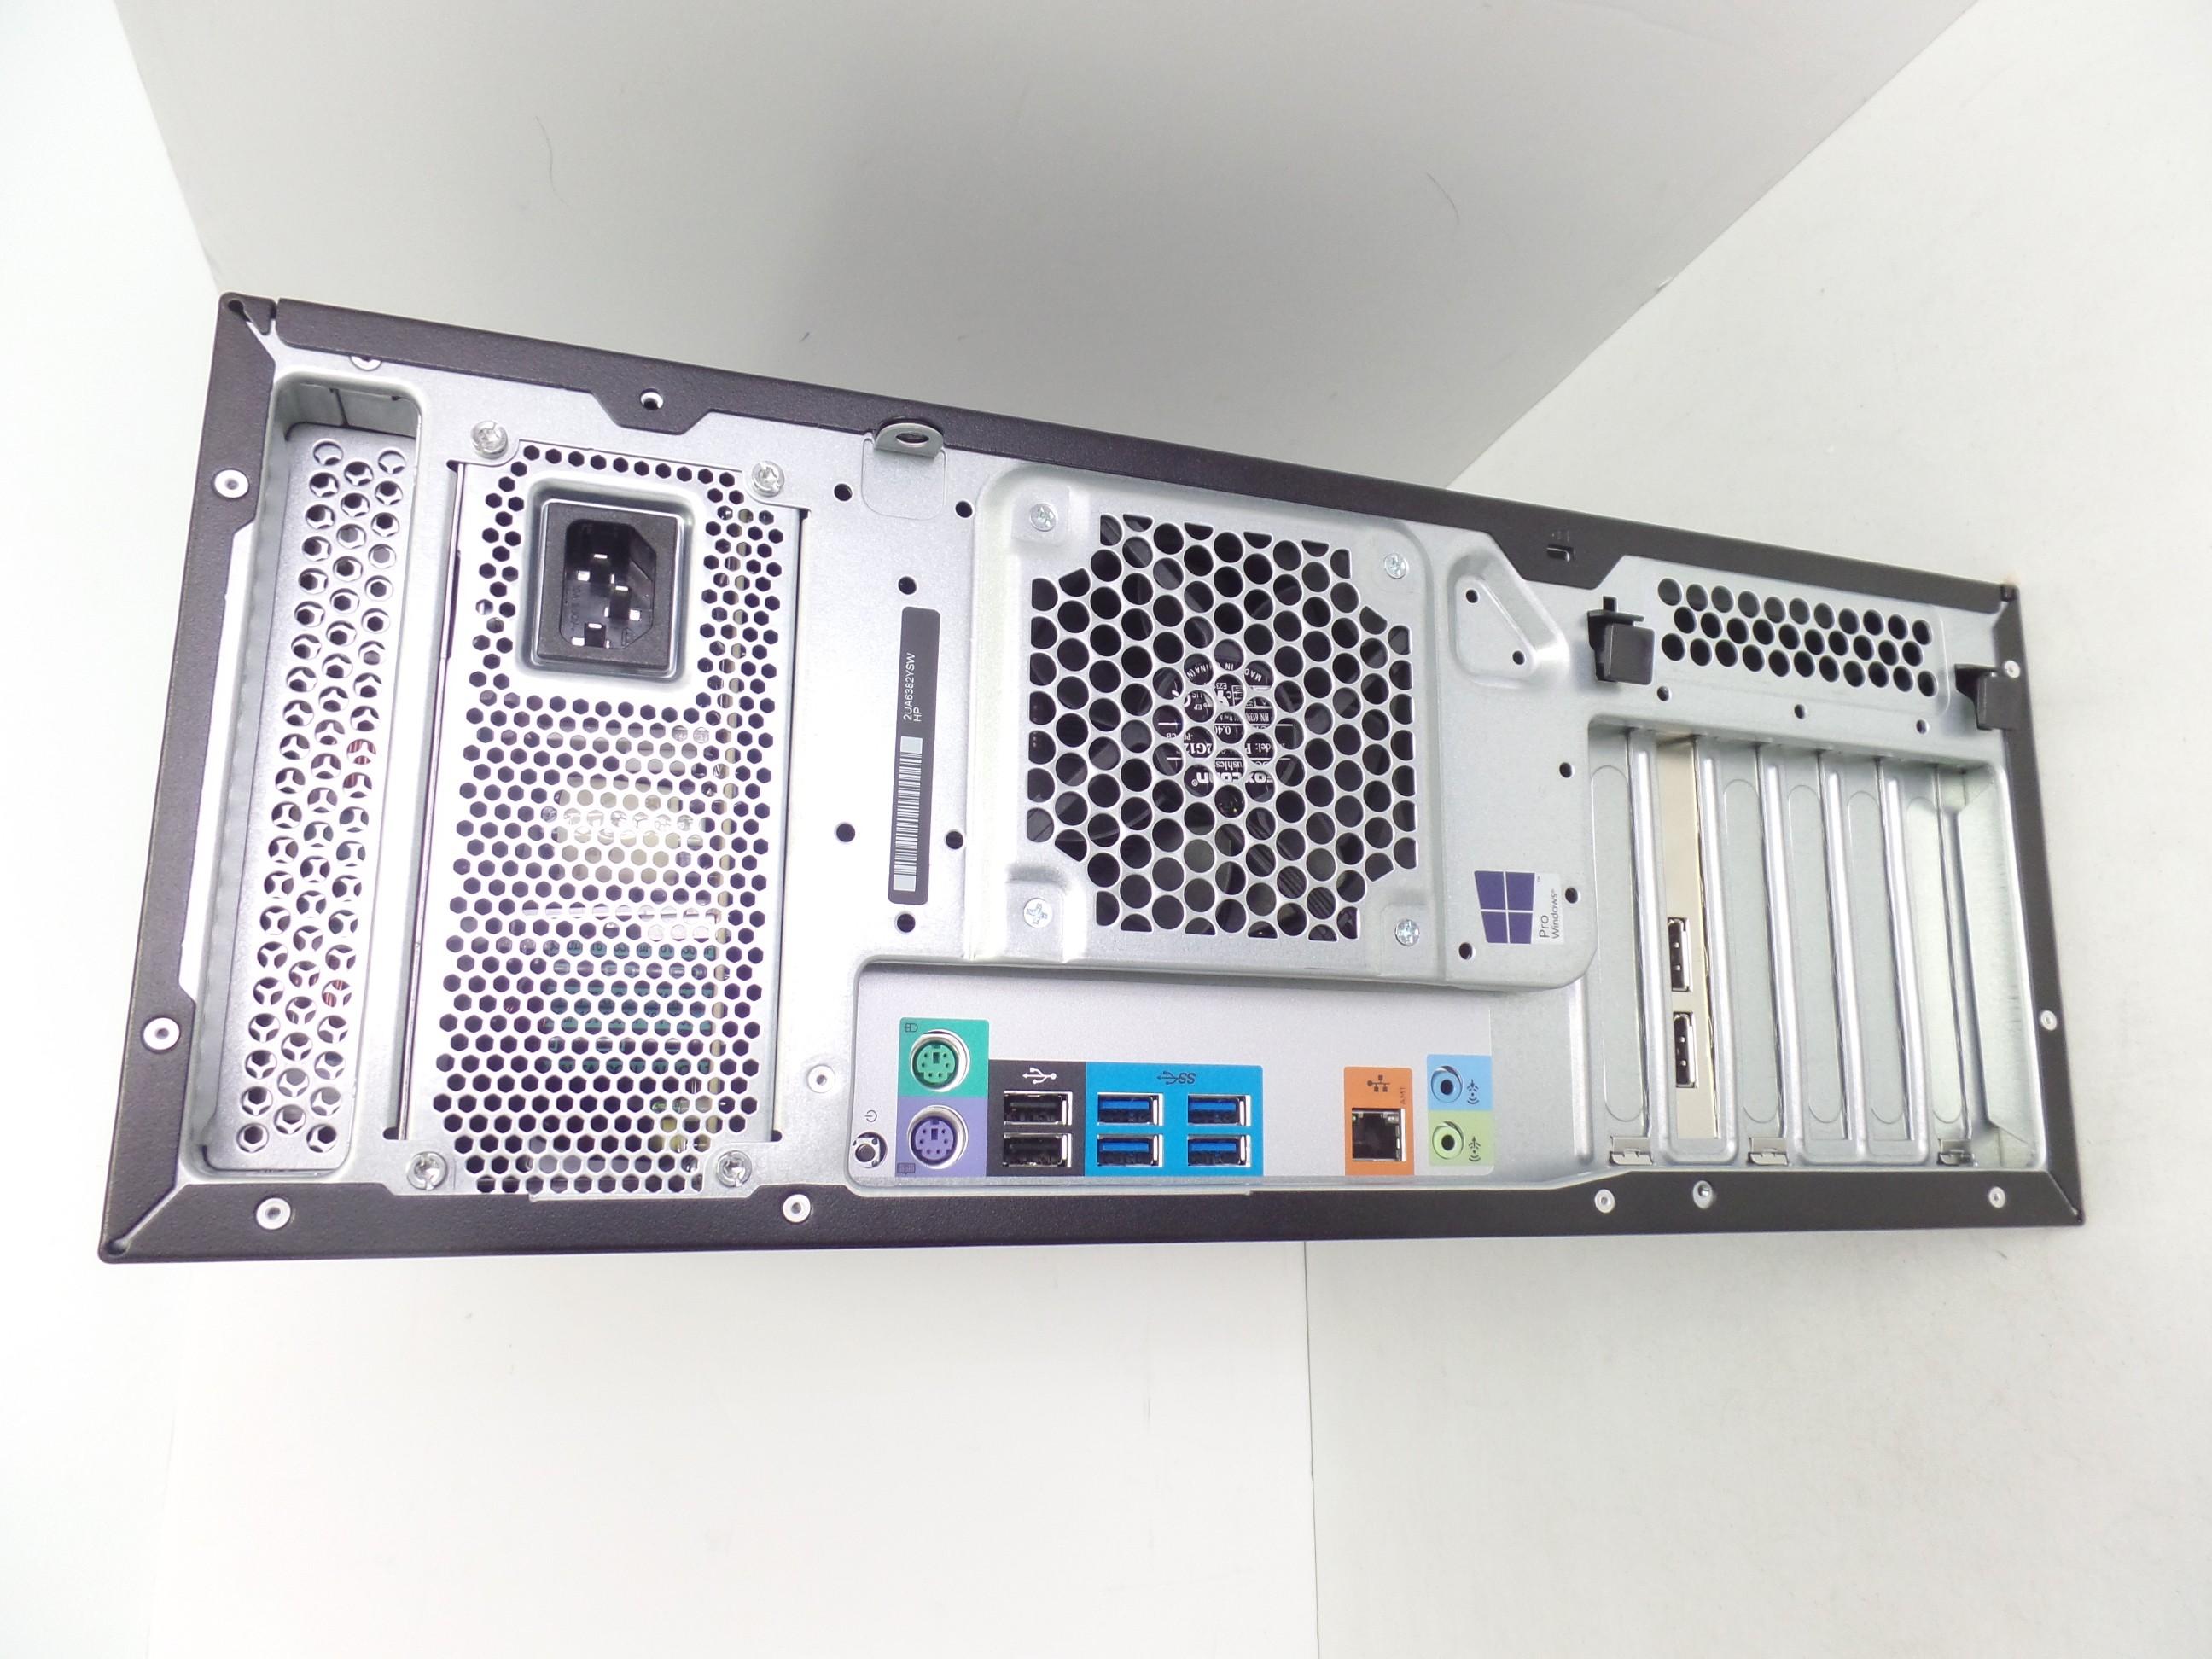 HP Z440 Tower Workstation Desktop Xeon E5-1603V3 2 8GHz 16GB 256GB W10  V9Y61UP S